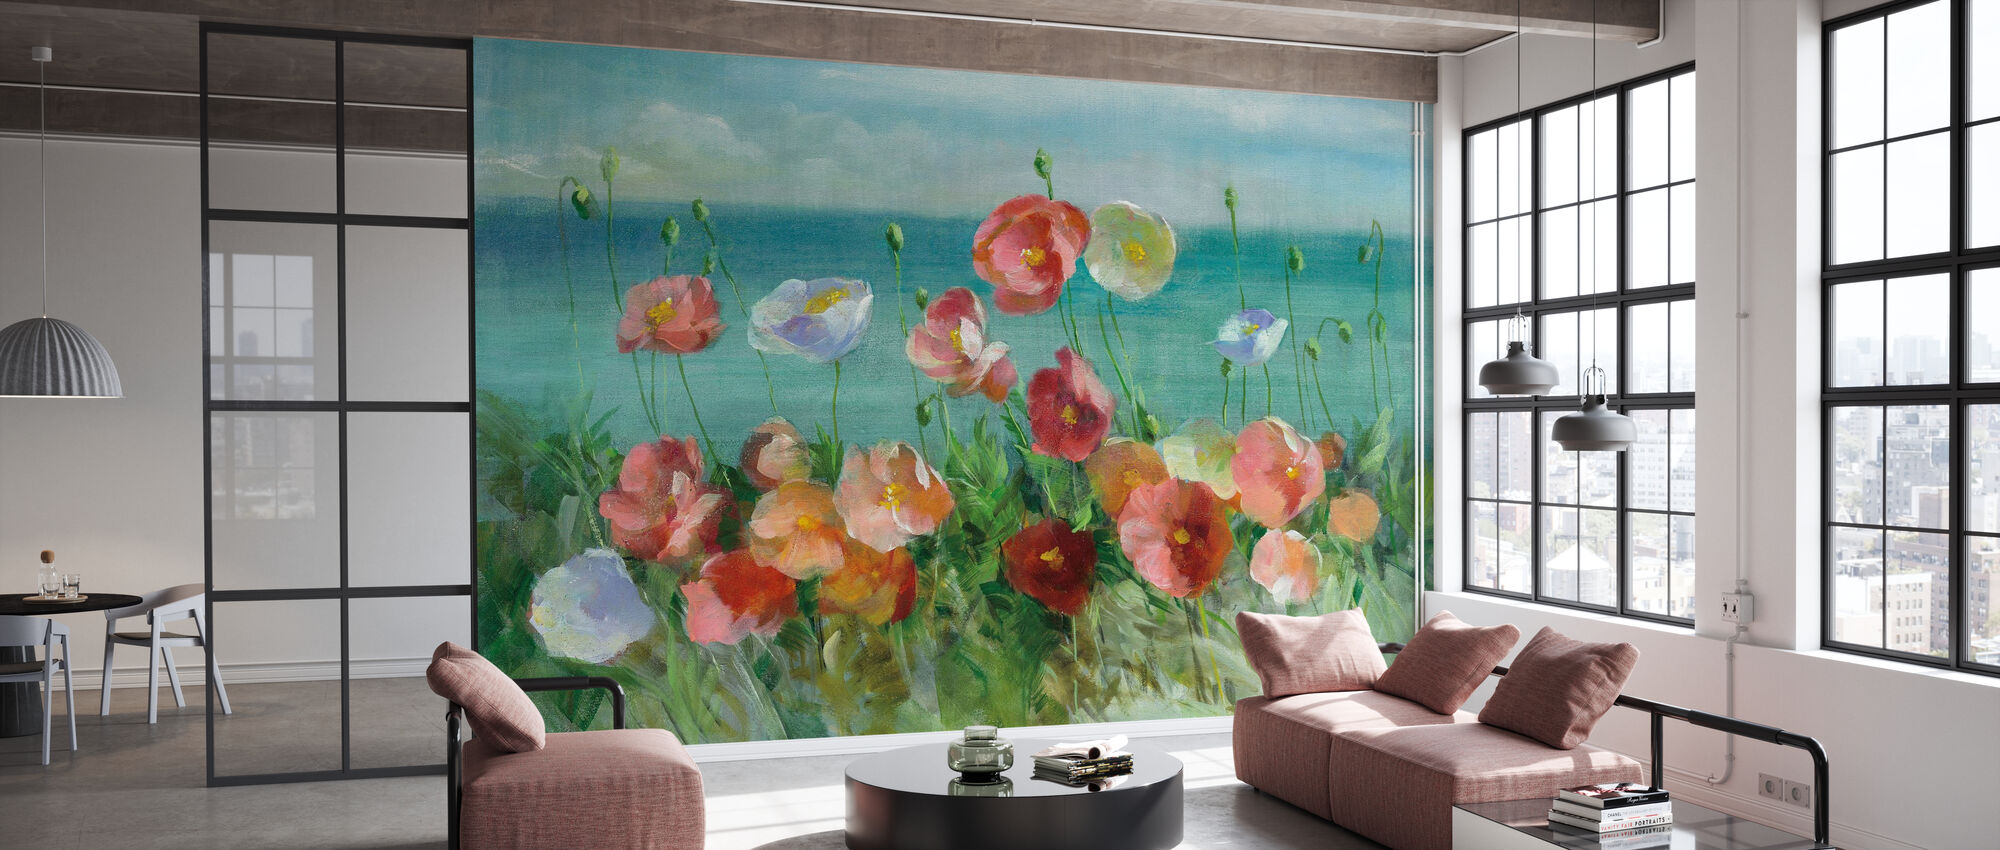 Coastal Poppies - Wallpaper - Office